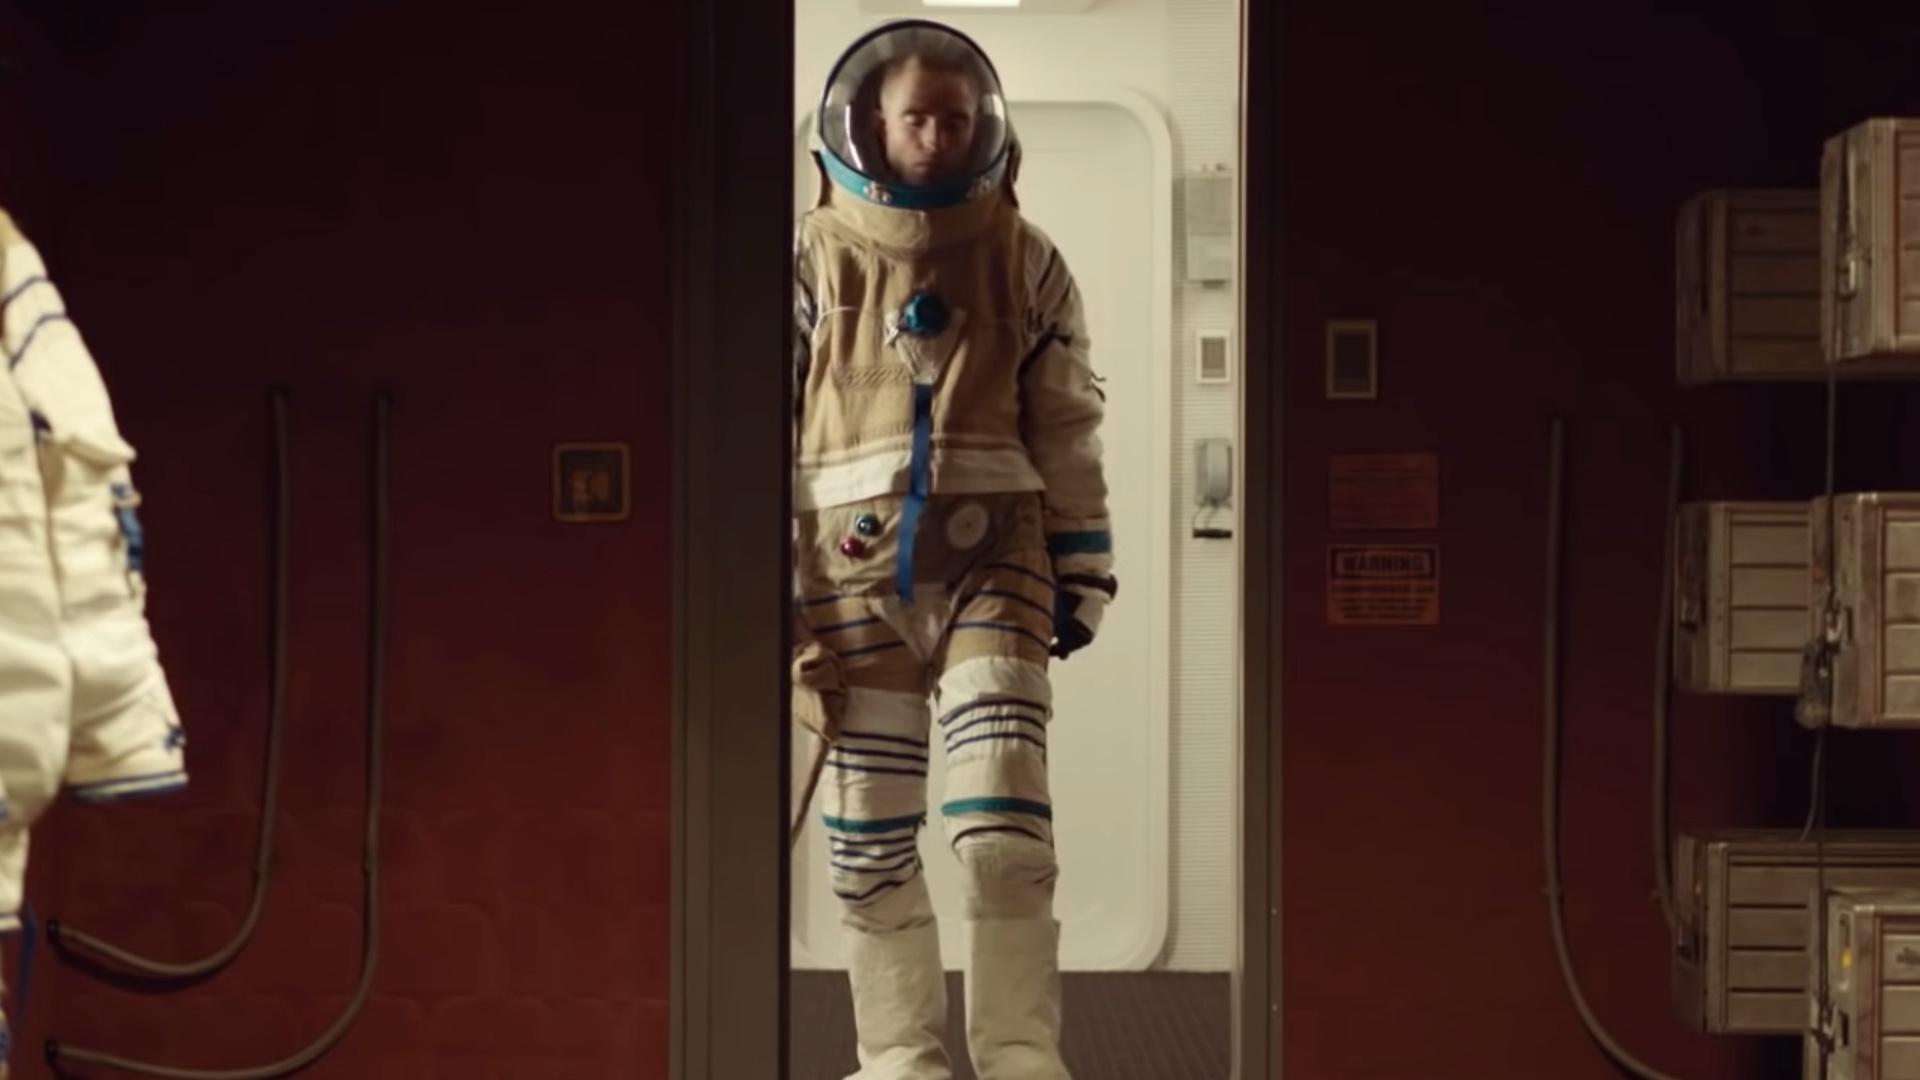 trailer-for-robert-pattinsons-cerebral-sci-fi-space-thriller-high-life-social.jpg